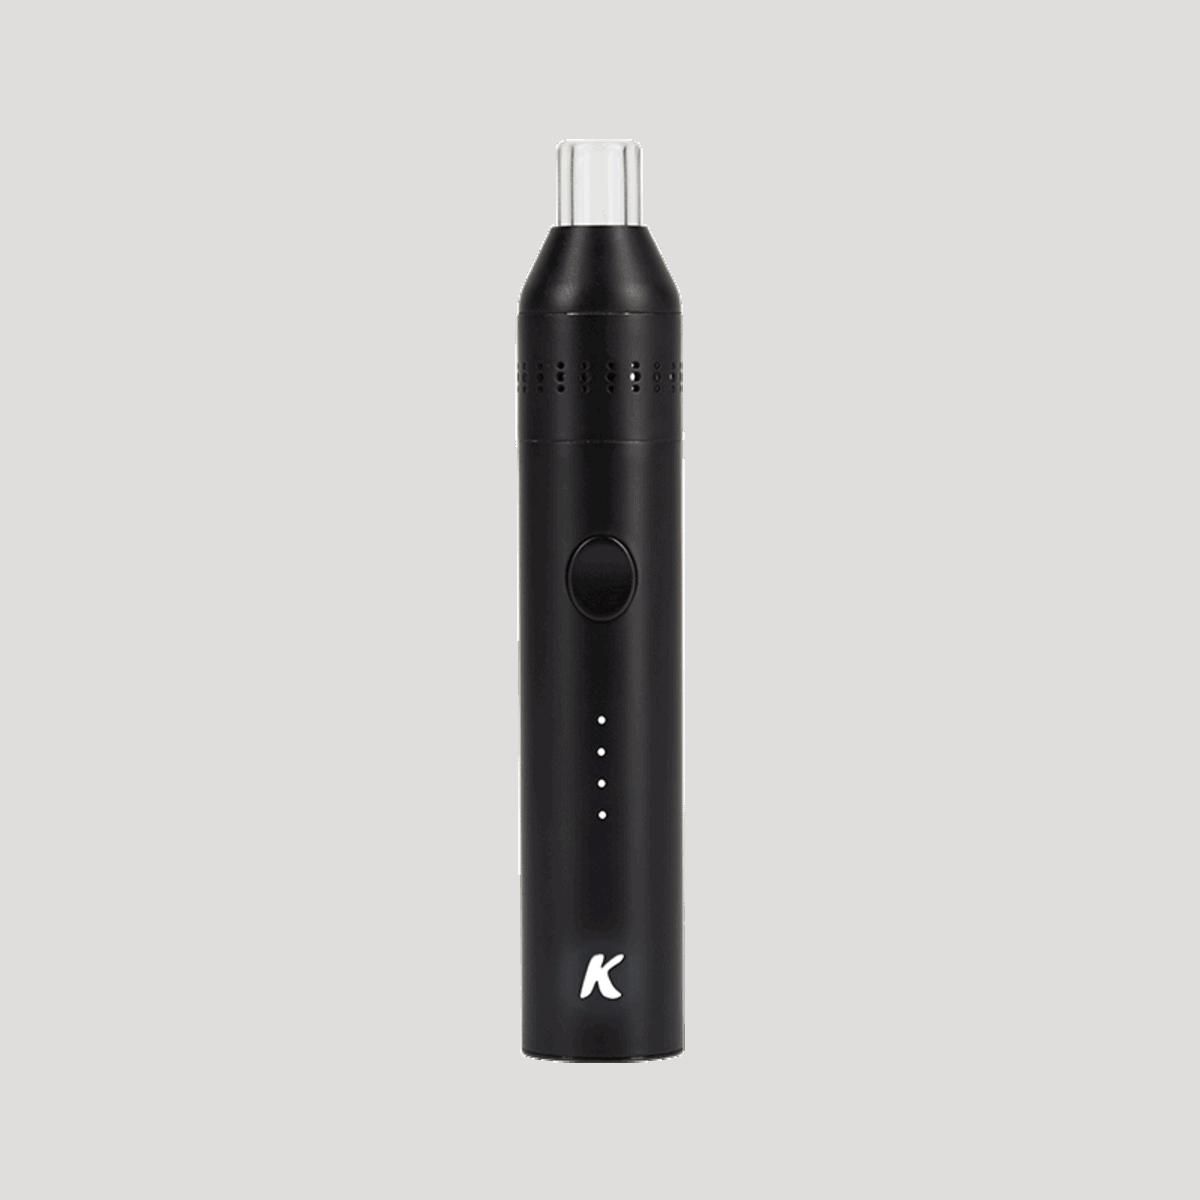 Kandy Pens Concentrate Vaporizer